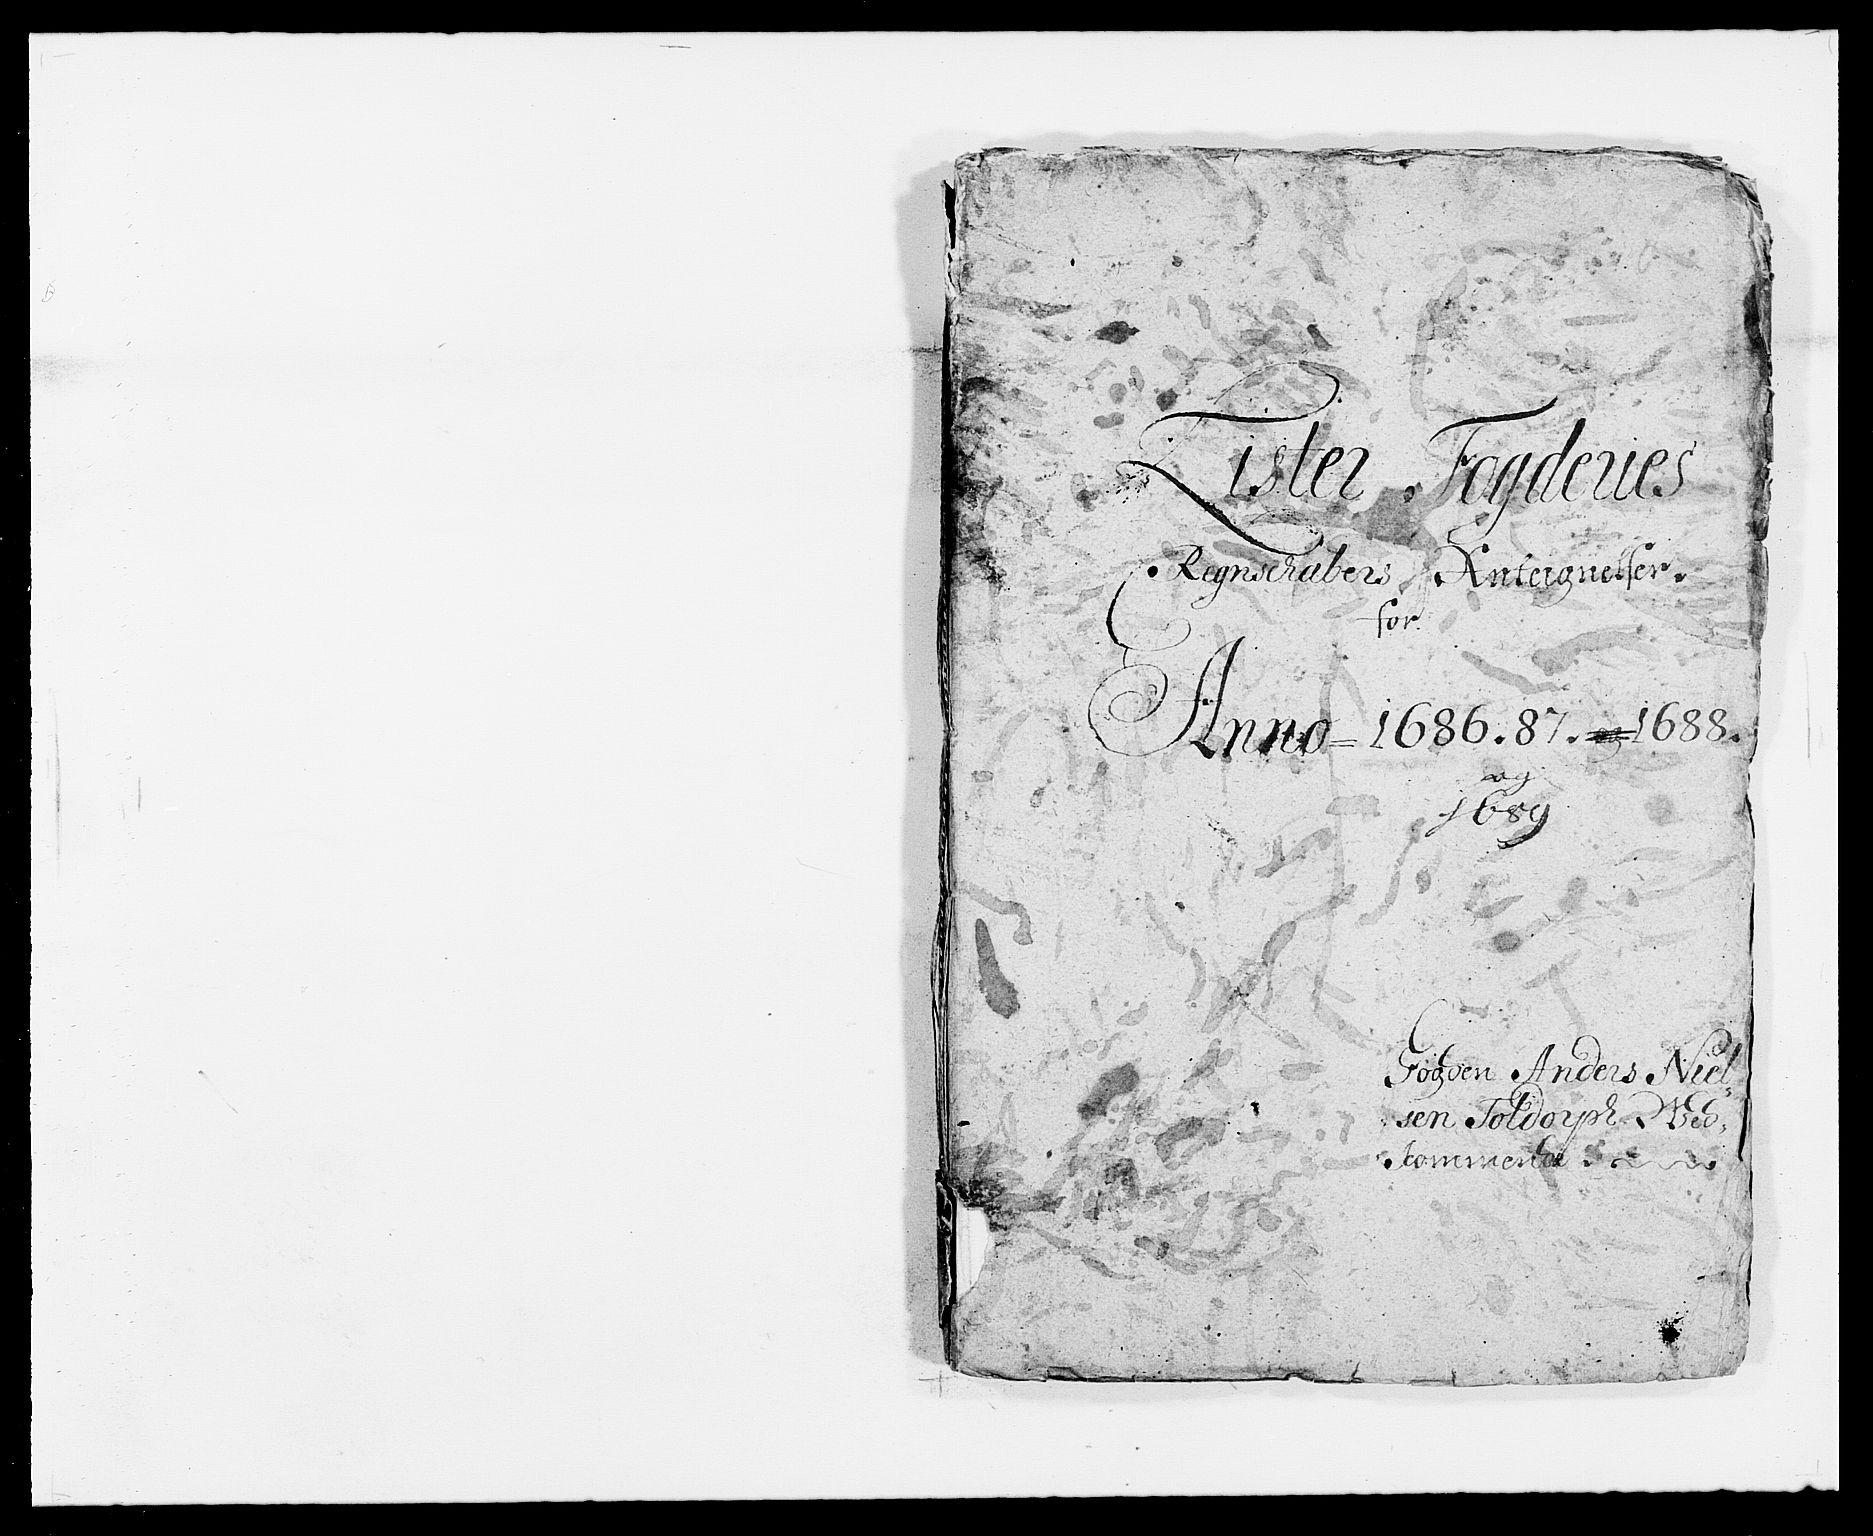 RA, Rentekammeret inntil 1814, Reviderte regnskaper, Fogderegnskap, R41/L2535: Fogderegnskap Lista, 1686-1689, s. 115